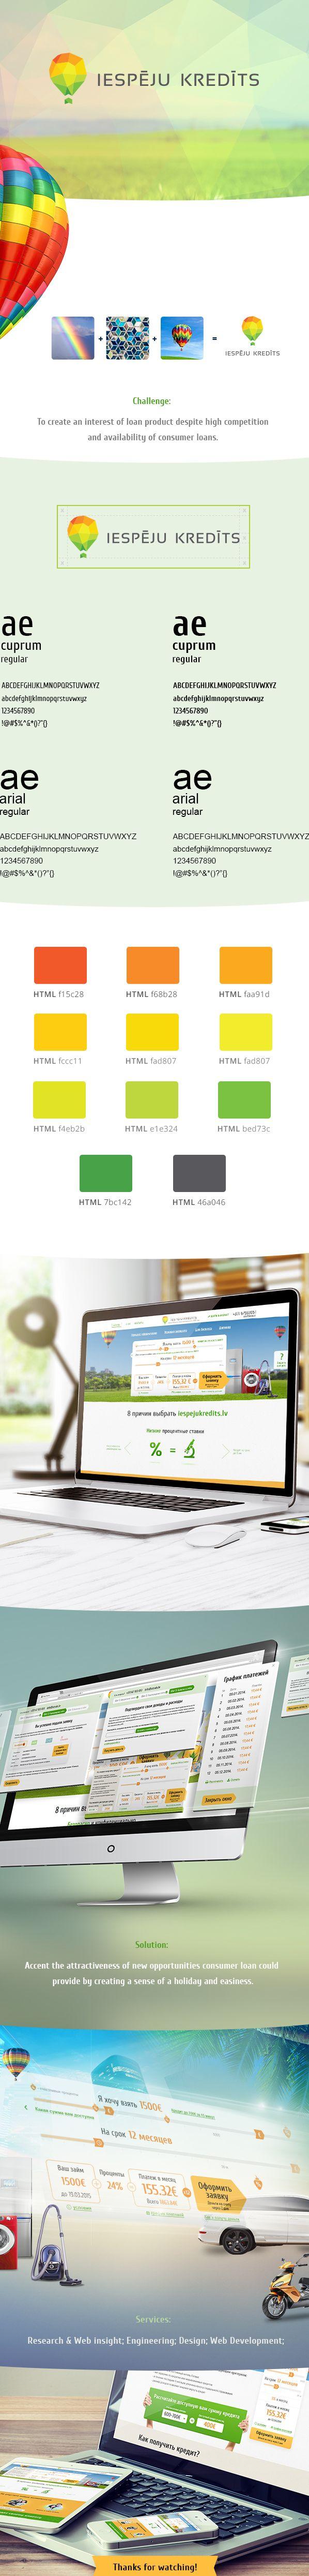 Breakthrough Web Concept for Loans Industry by uxdesignagency.com #fintech #finance #finserv #banking #banks #digitalbanking #onlinebanking #mobilebanking #bankingui #bankingux #bankux #financialui #mobilefinance #financialux #userexperience #uxdesign #uxui #ux #ui #uxdesignagency #bankdesign #financialdesign #design #webdesign #mobiledesign #mobileappdesign #mobileapp #paymentsui #banktech #financeappdesign #financialexperts #futurebanking #futurefinance